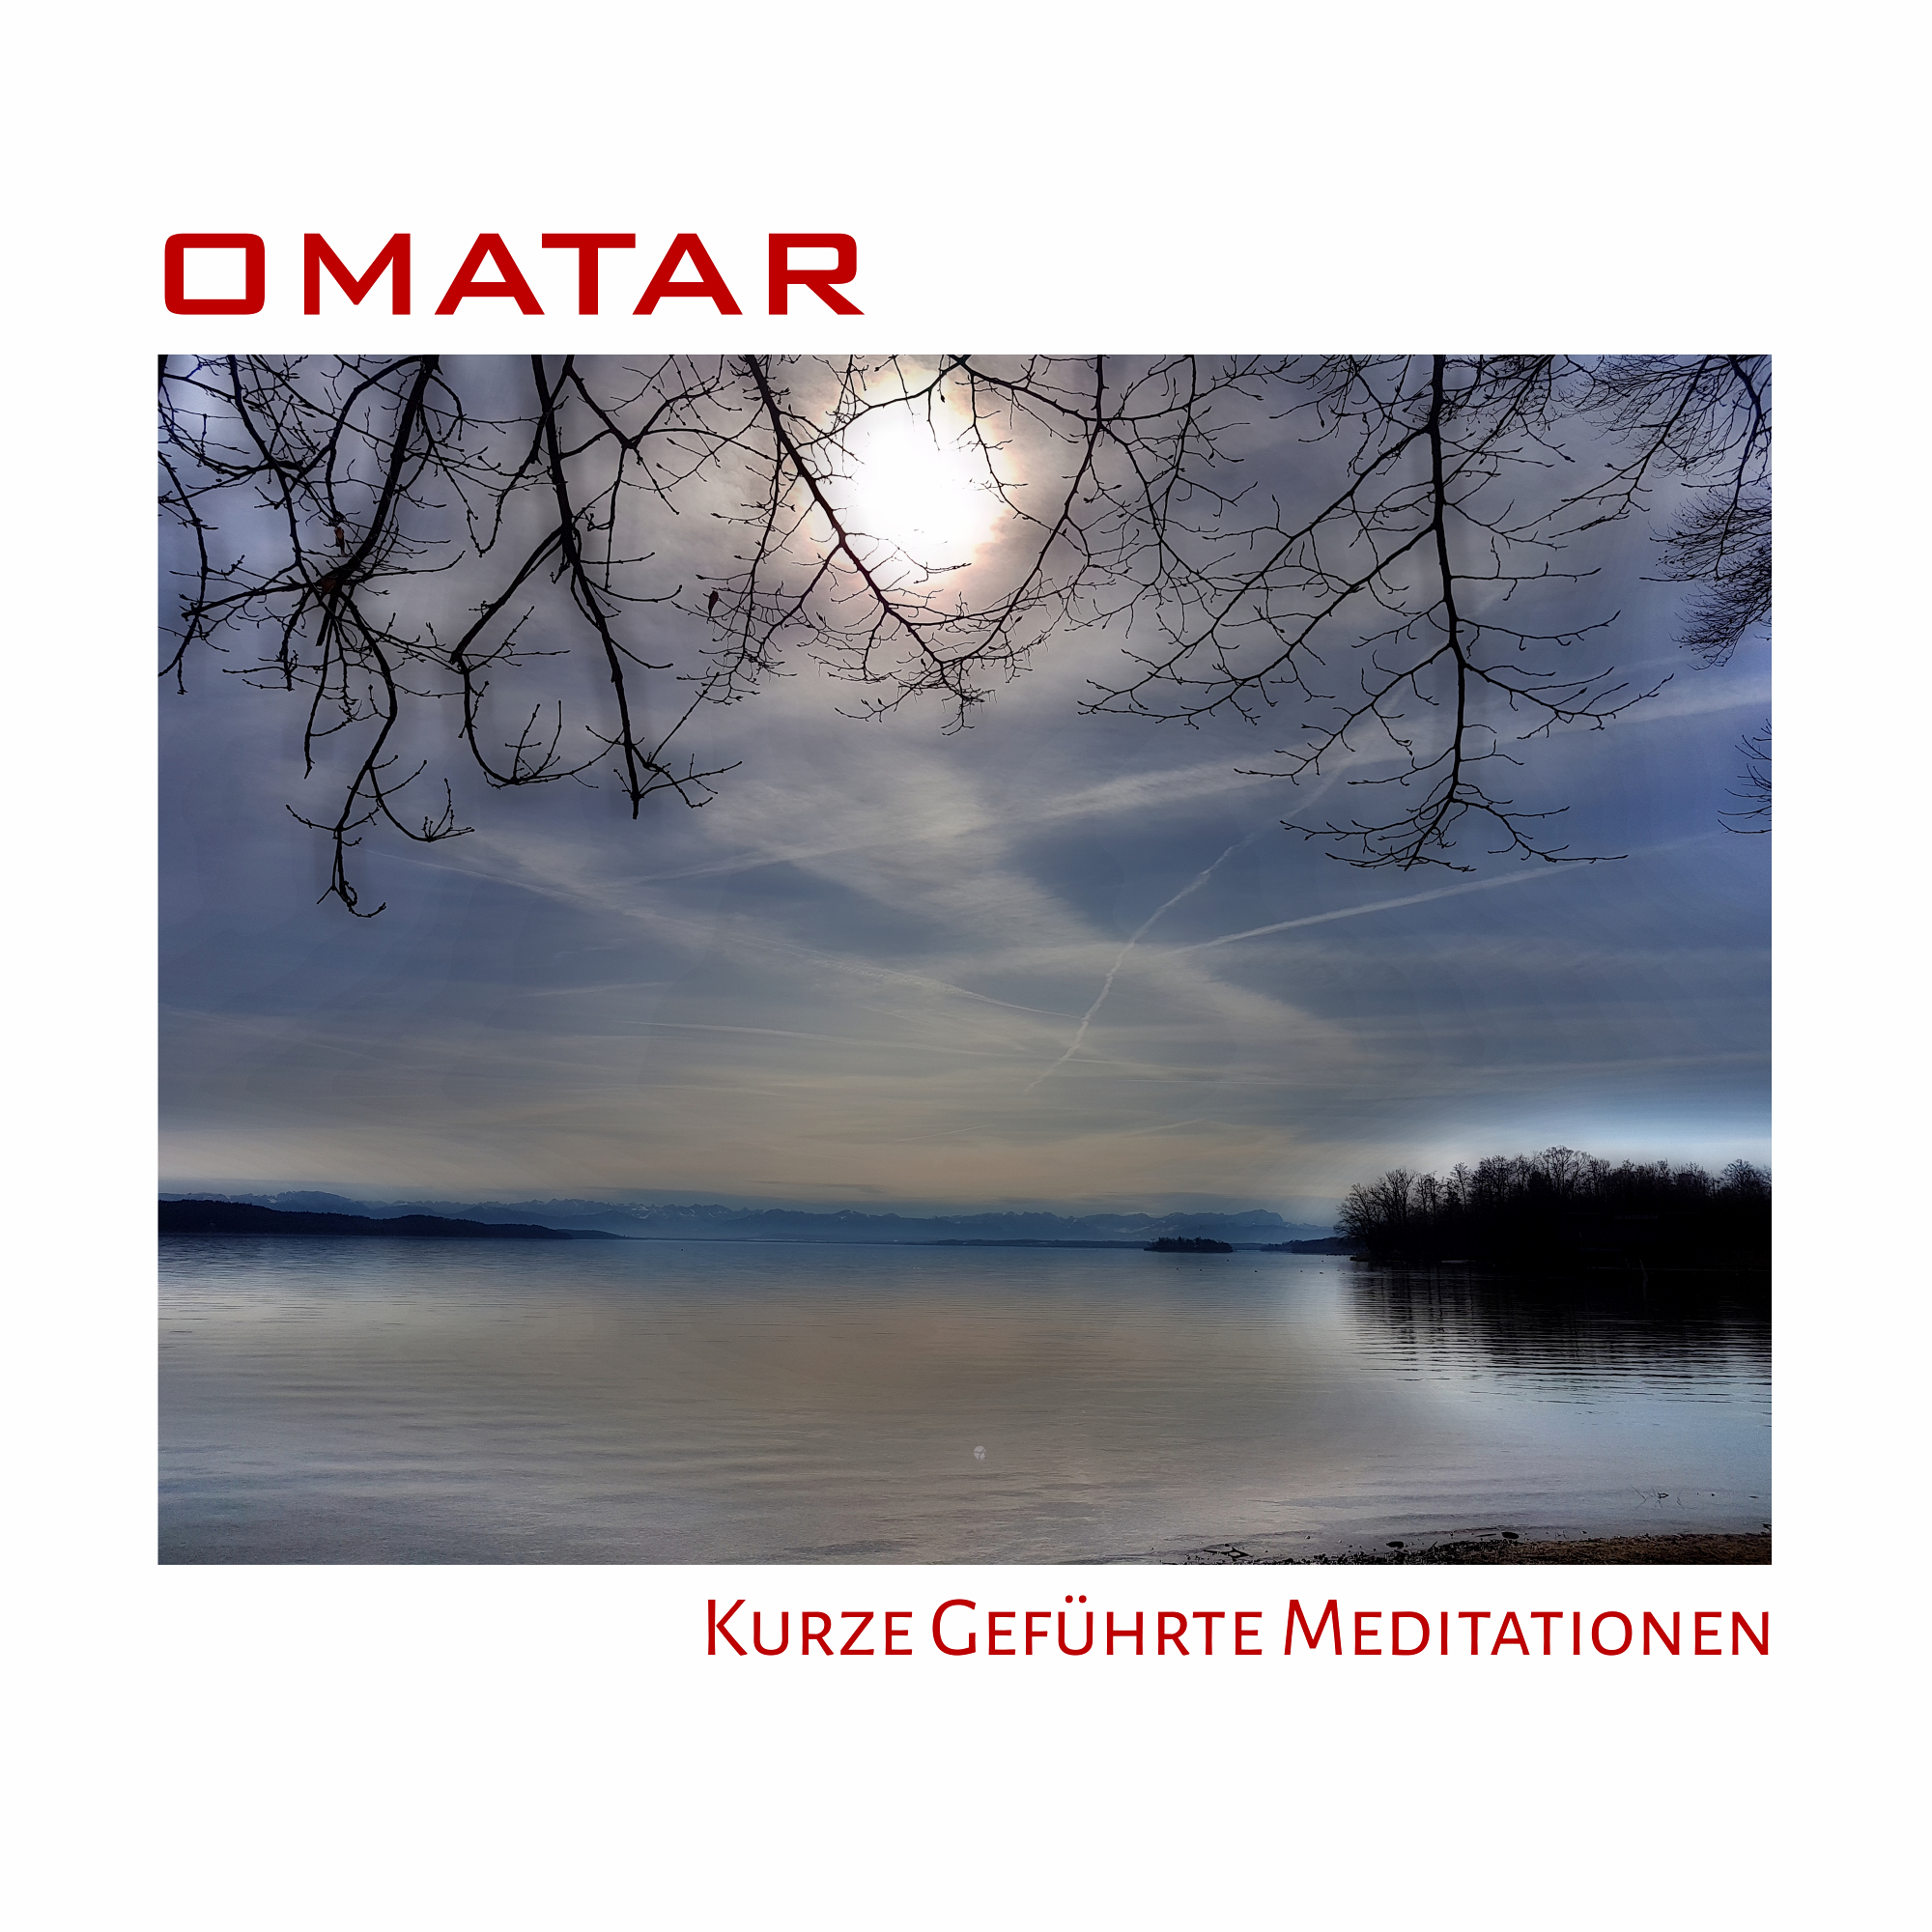 Omatar-kurze-geführte-Meditationen